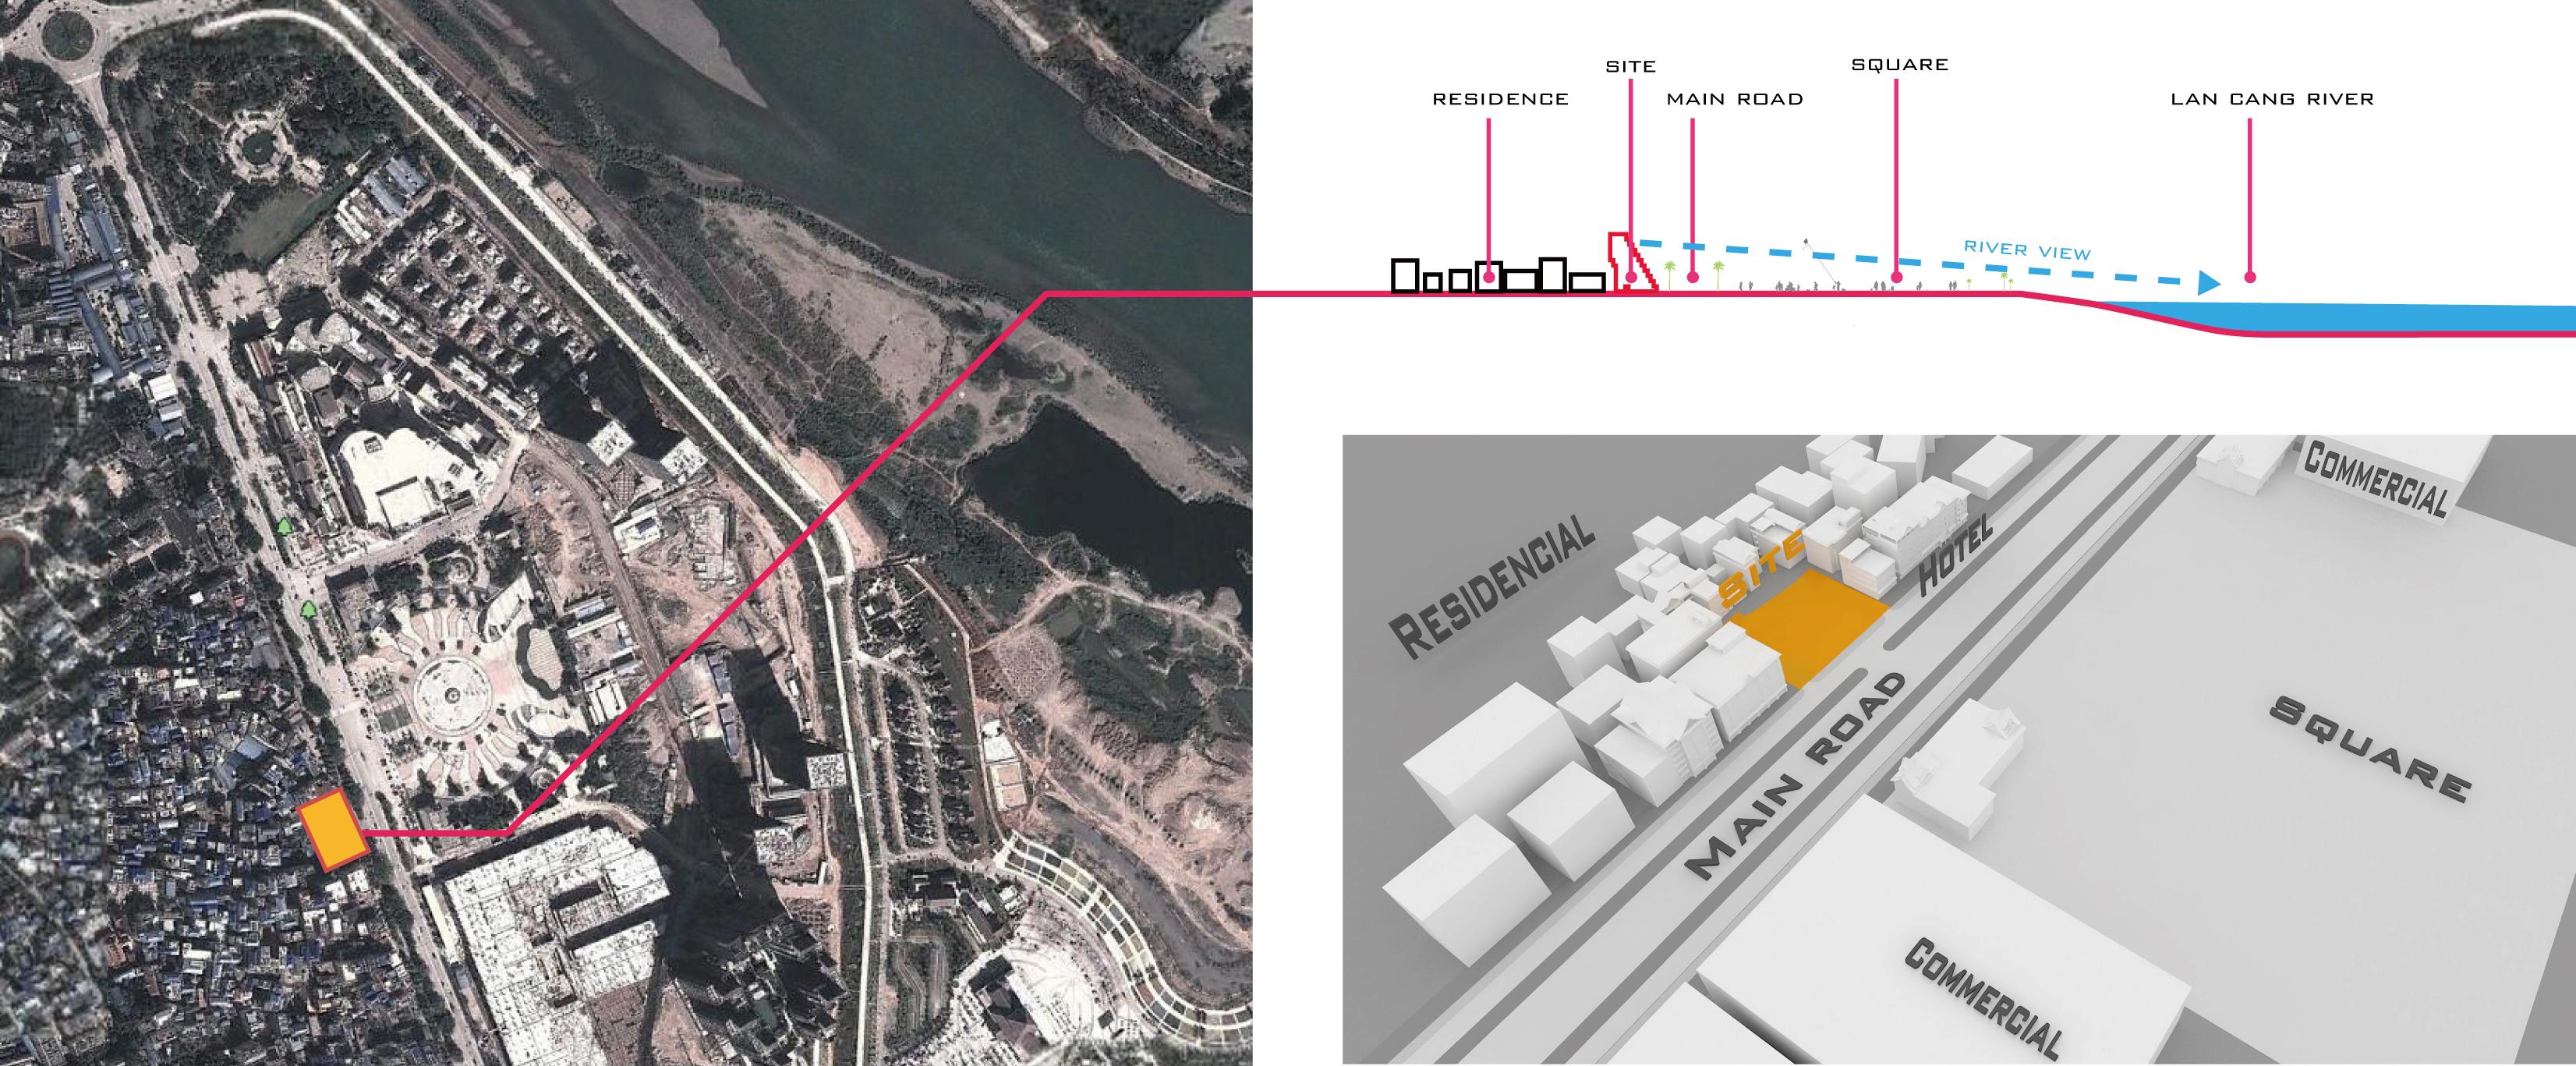 Xishuangbanna_Diagram_Background01